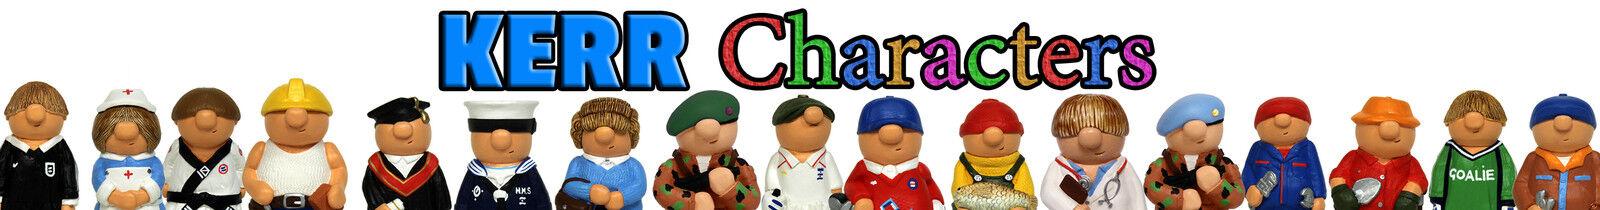 Kerr Characters